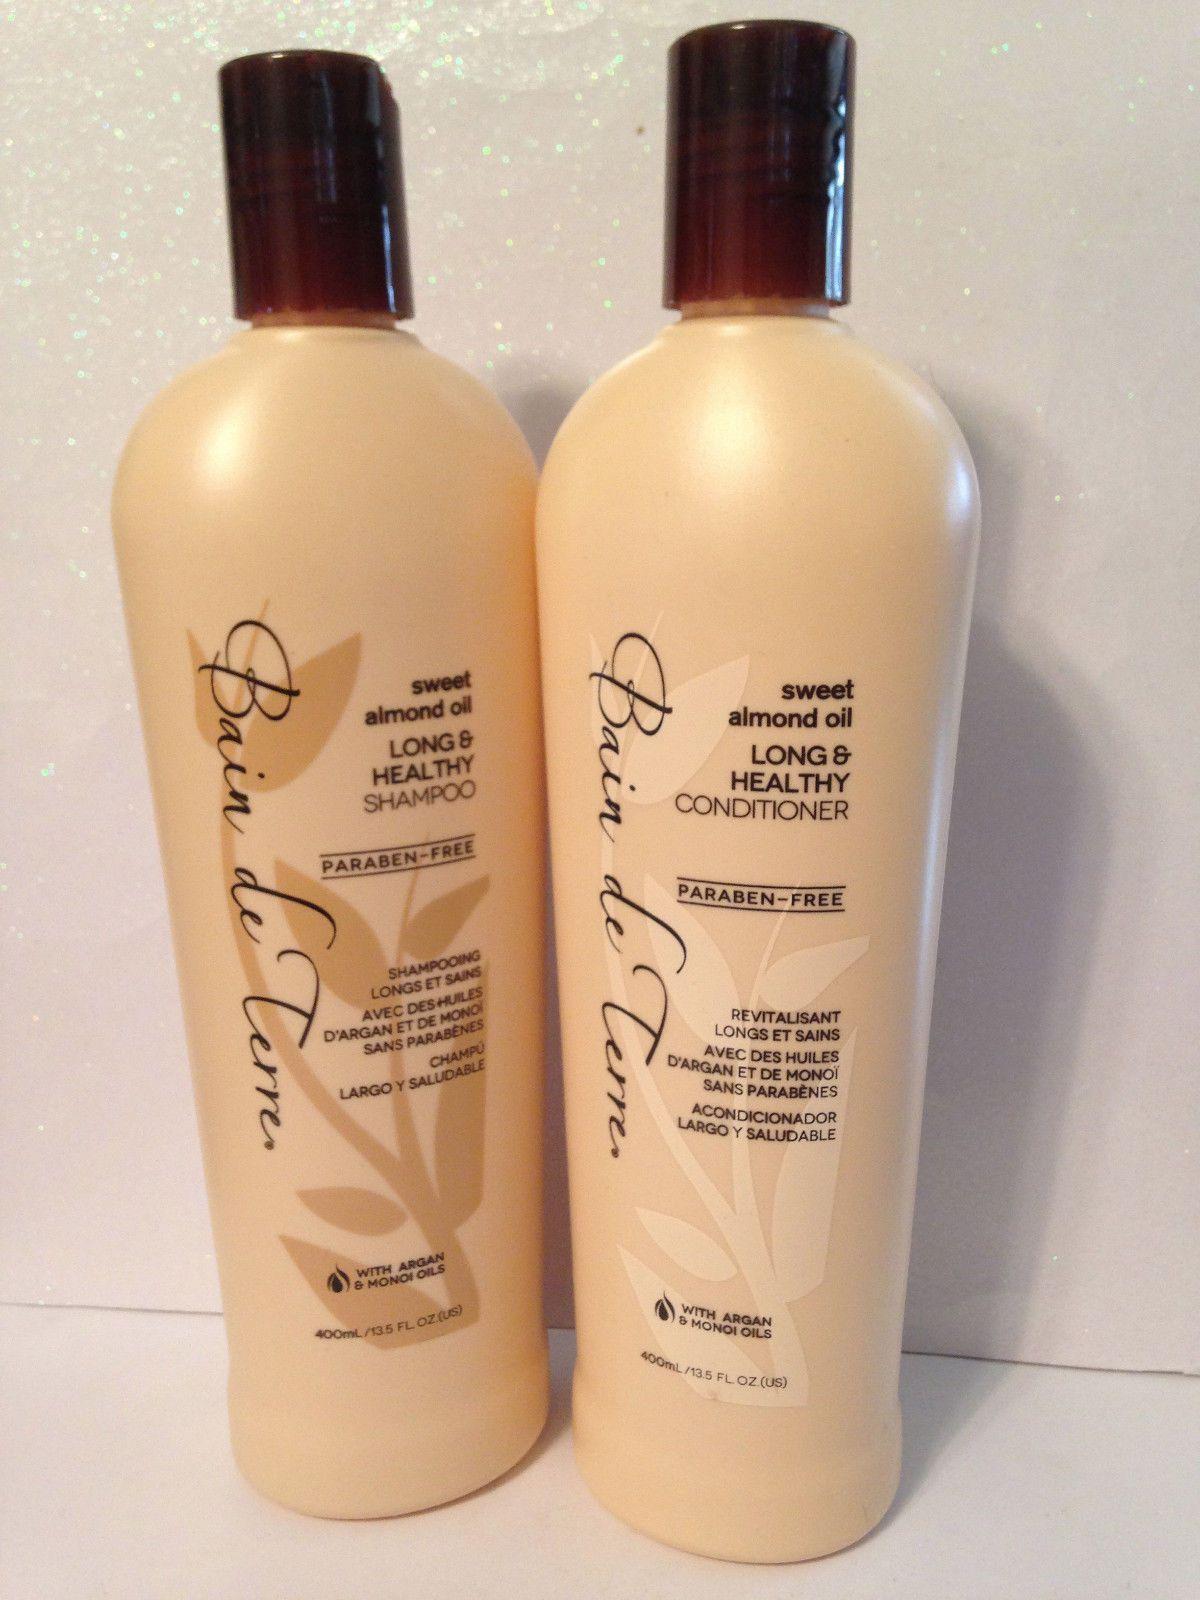 Diabetic Shampoo : diabetic, shampoo, Terre, Sweet, Almond, Shampoo, Conditioner, Litre, Healthy, Shampoo,